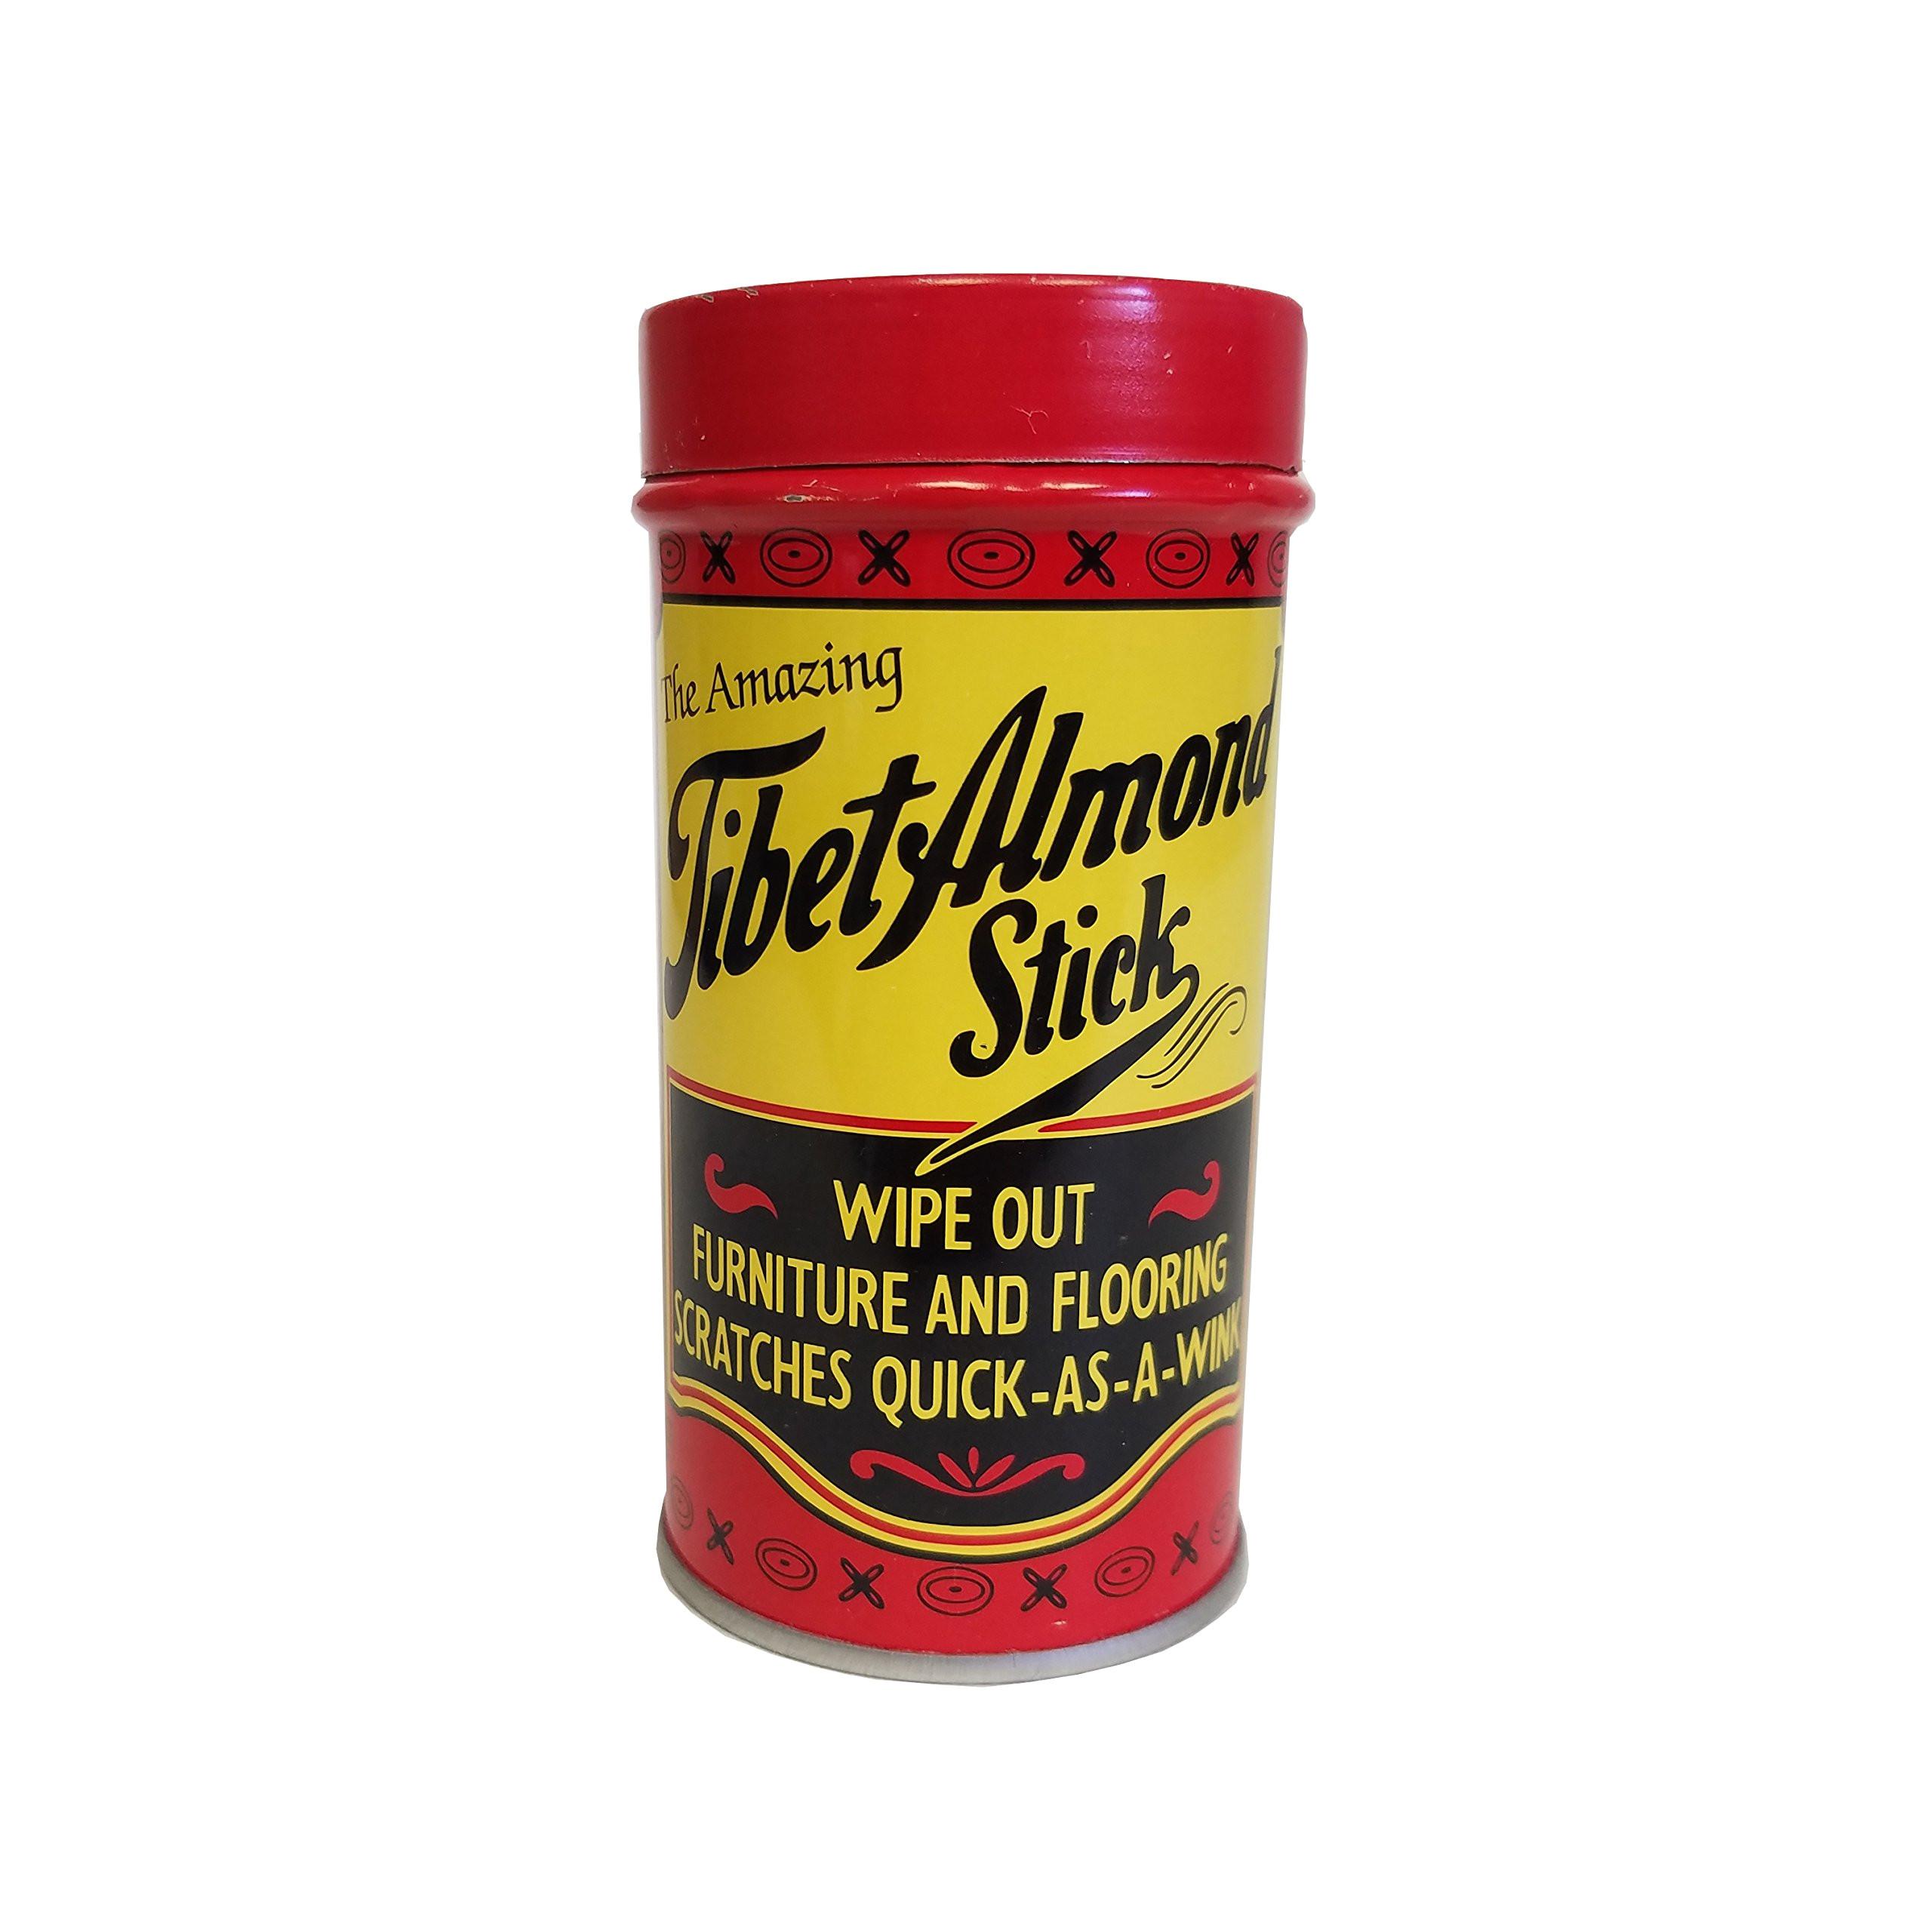 tibet almond stick scratch remover